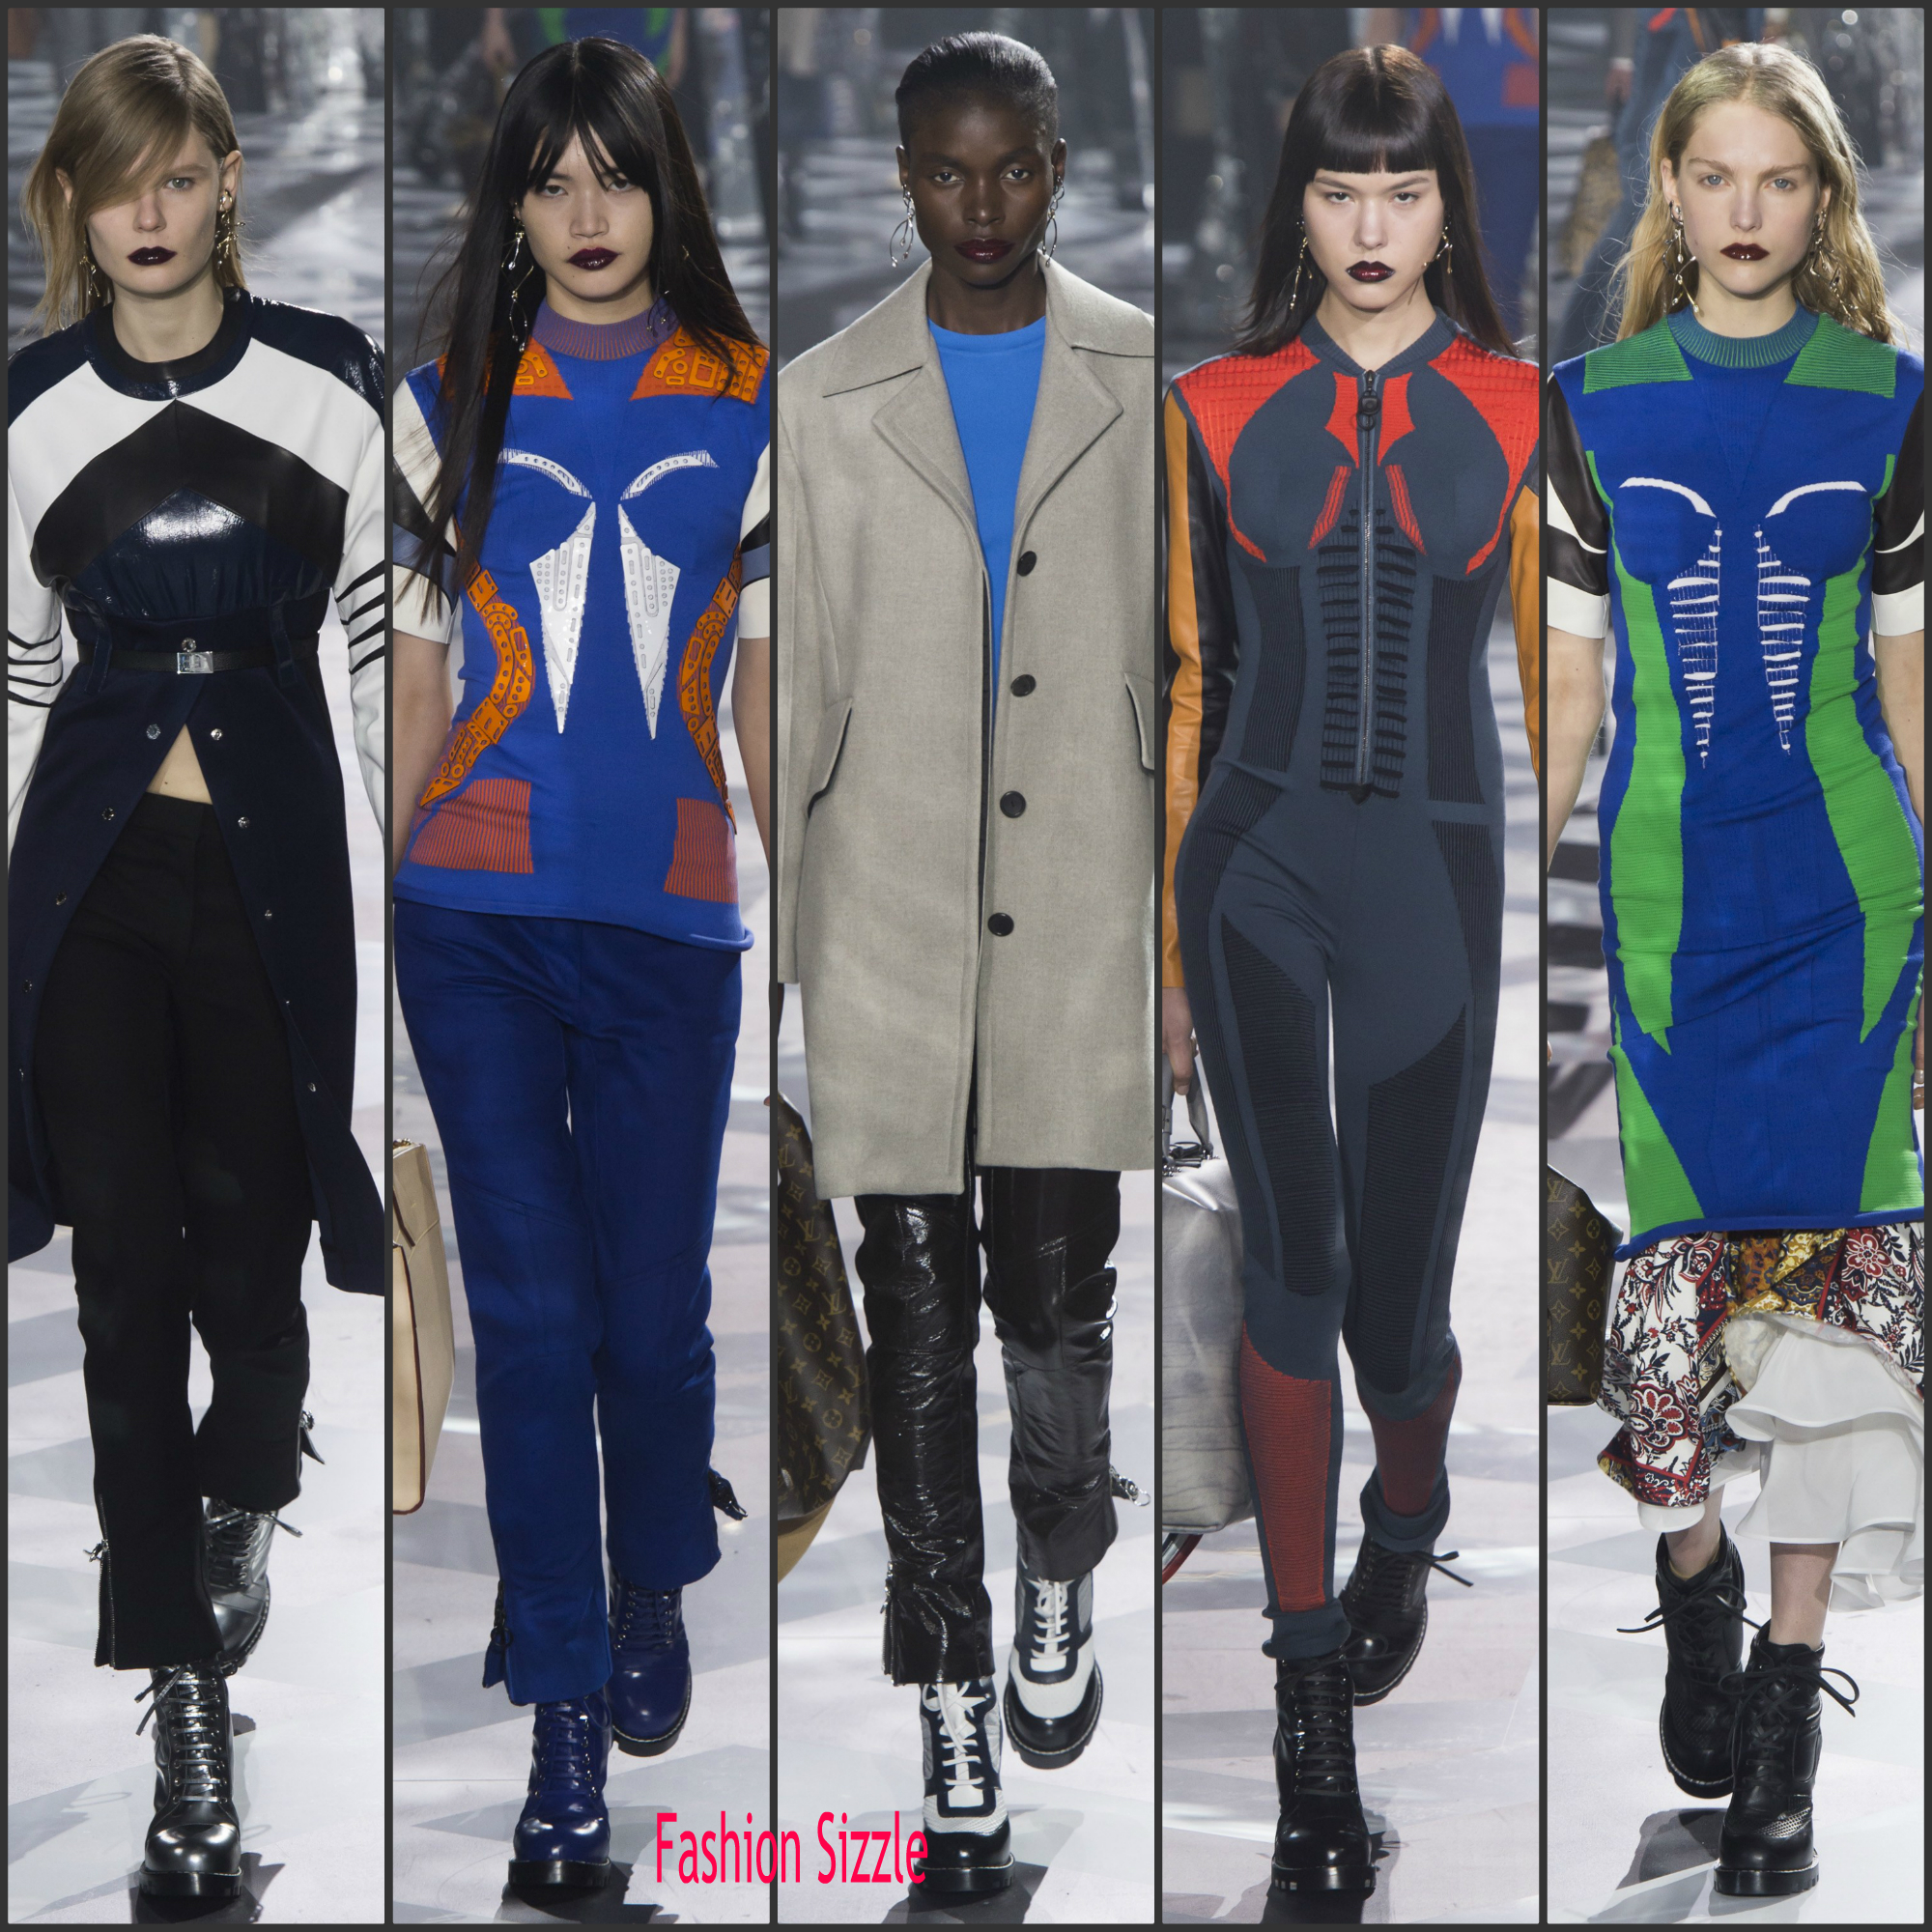 louis-vuitton-fall-2016-rtw-collection-sporstwear-chic